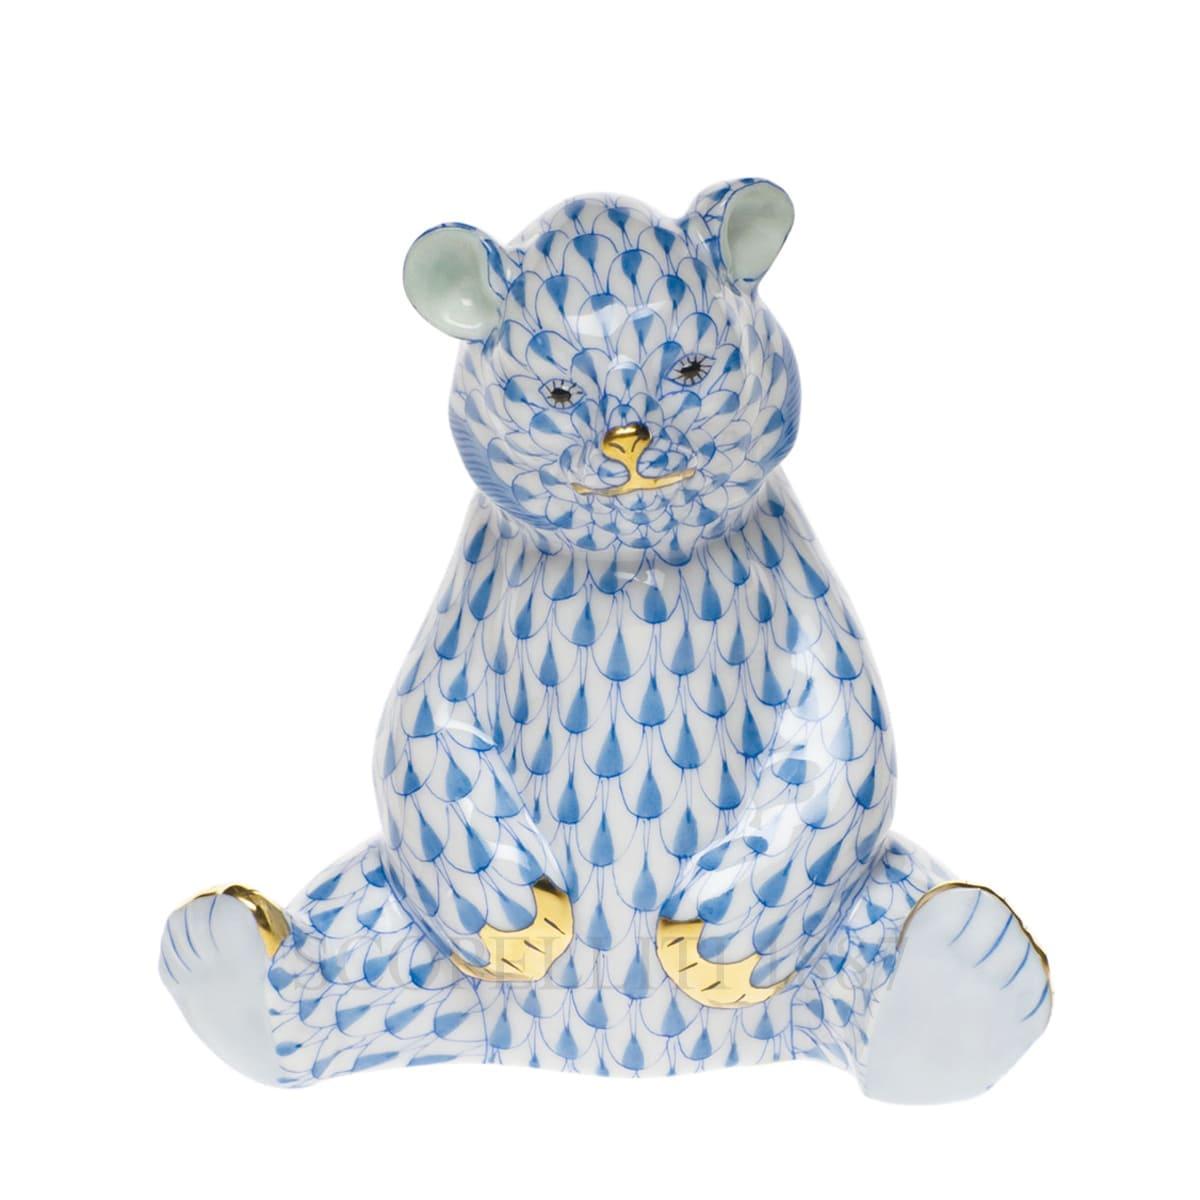 herend porcelain sitting bear figurine blue